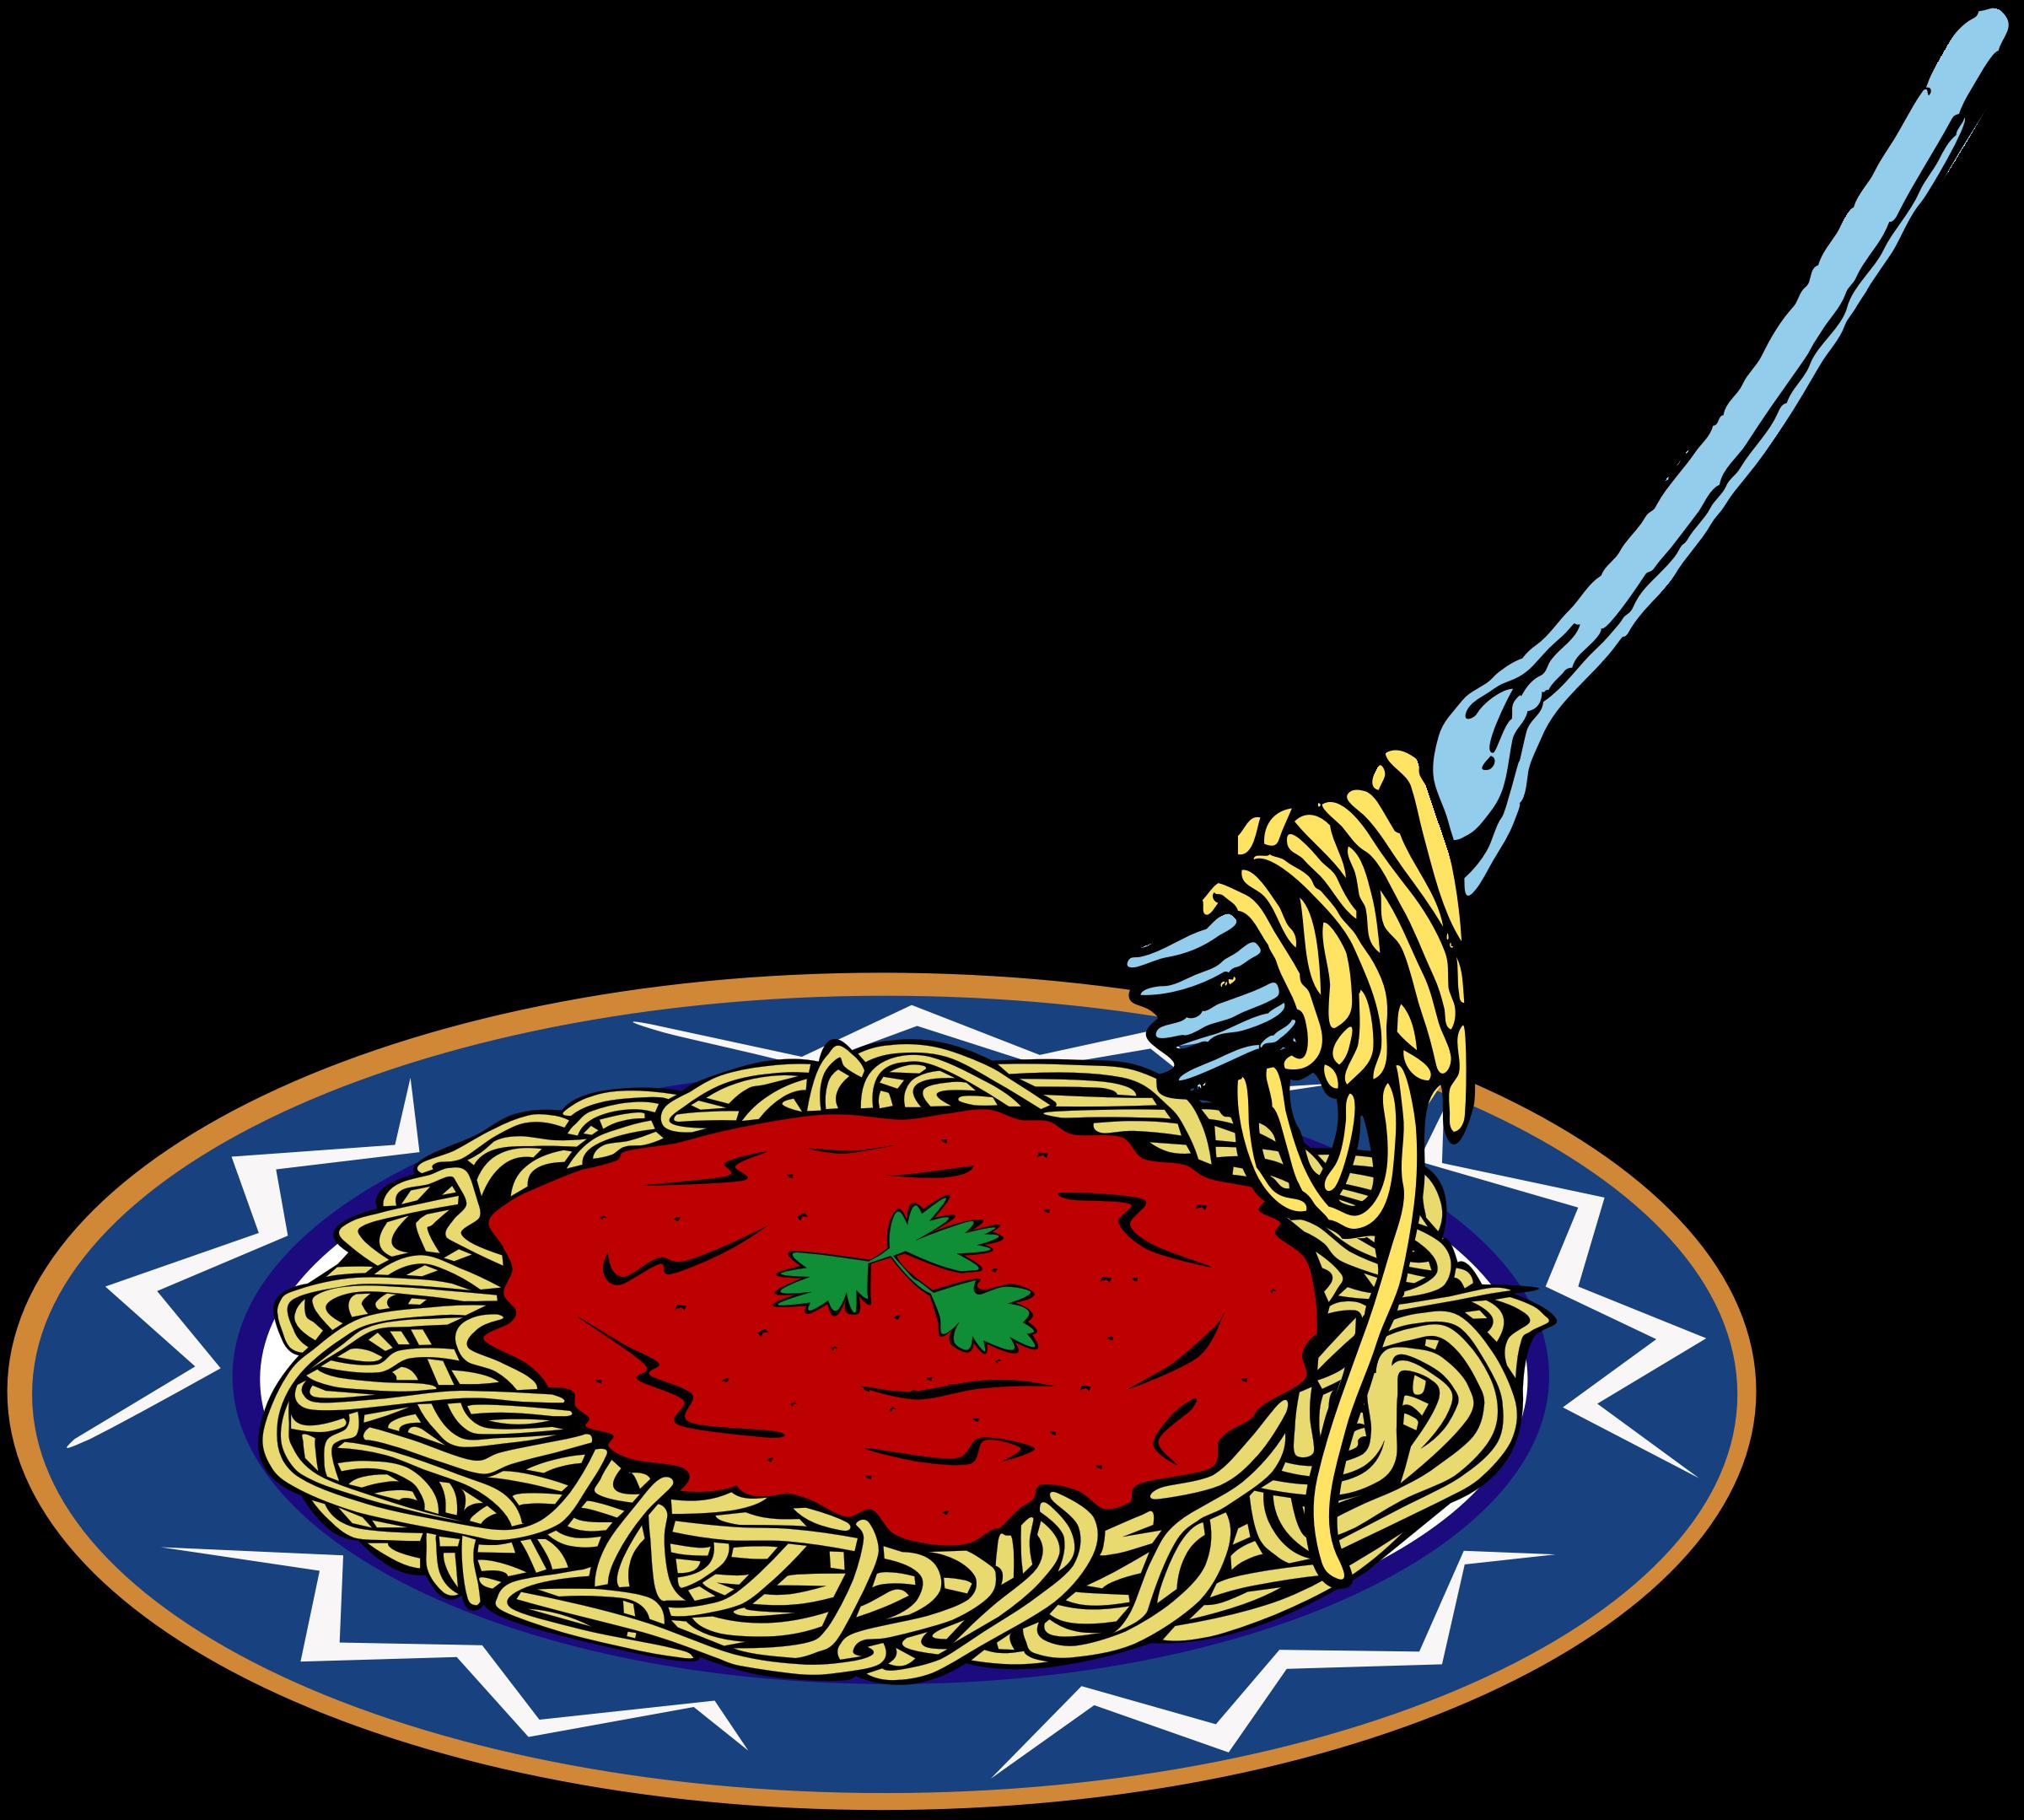 2400x2158 Spaghetti Dinner Fundraiser Flyer Template Clipart